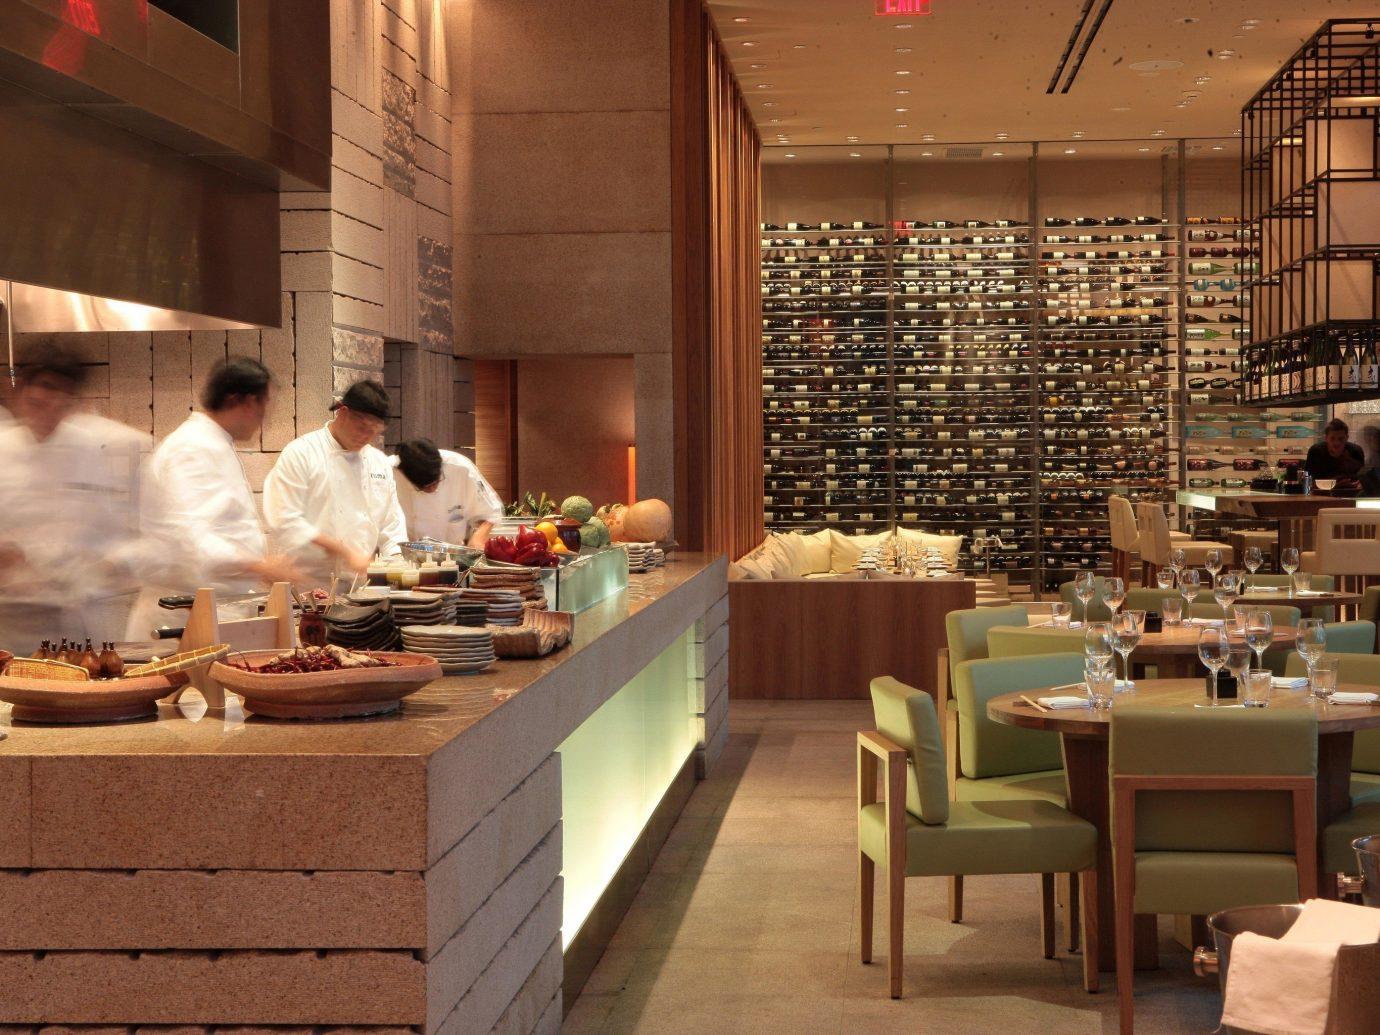 Trip Ideas table indoor floor restaurant meal café interior design cuisine food buffet brunch area